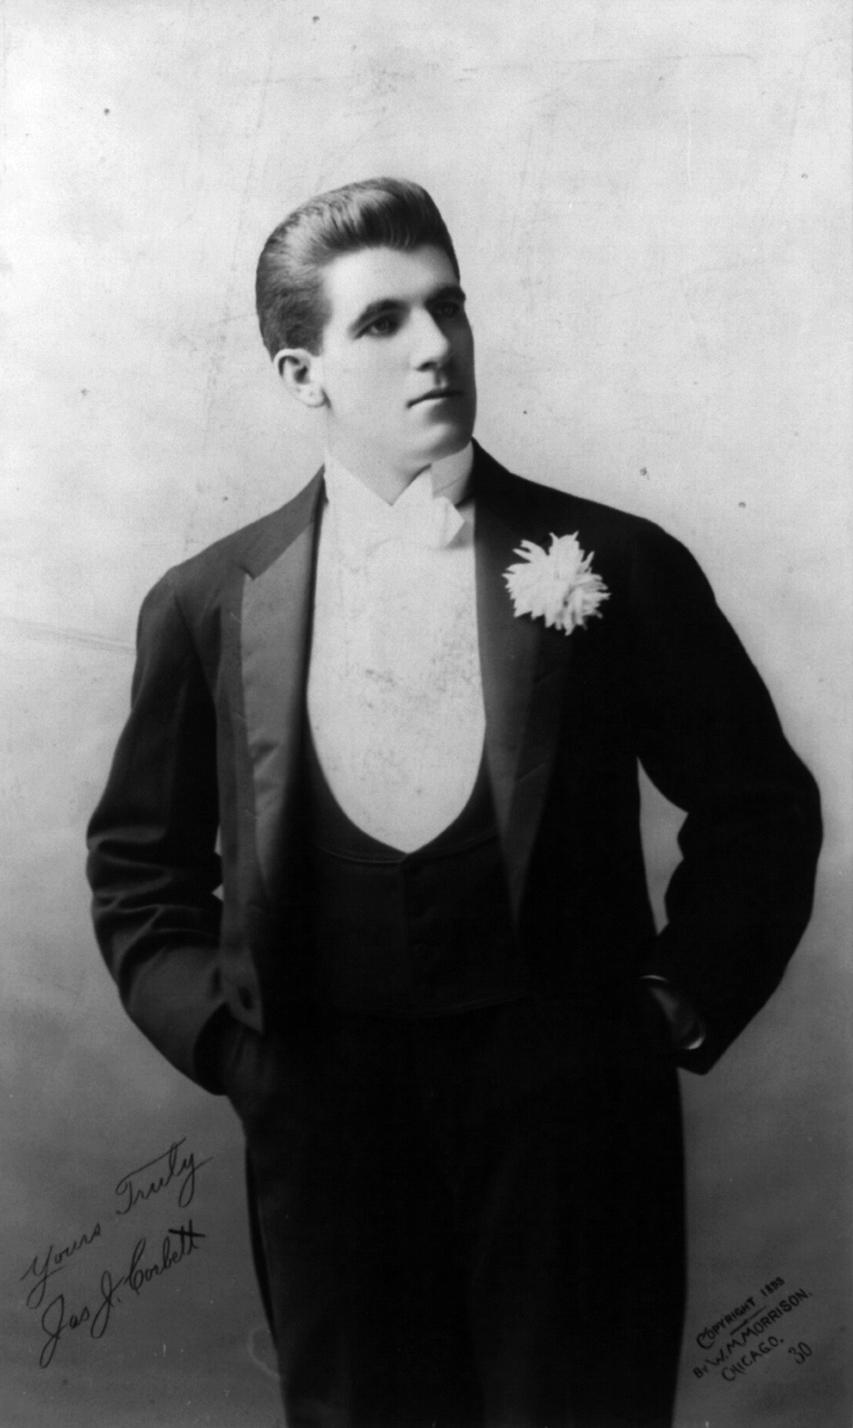 File:James John Corbett cph.3b19129.jpg - Wikimedia Commons